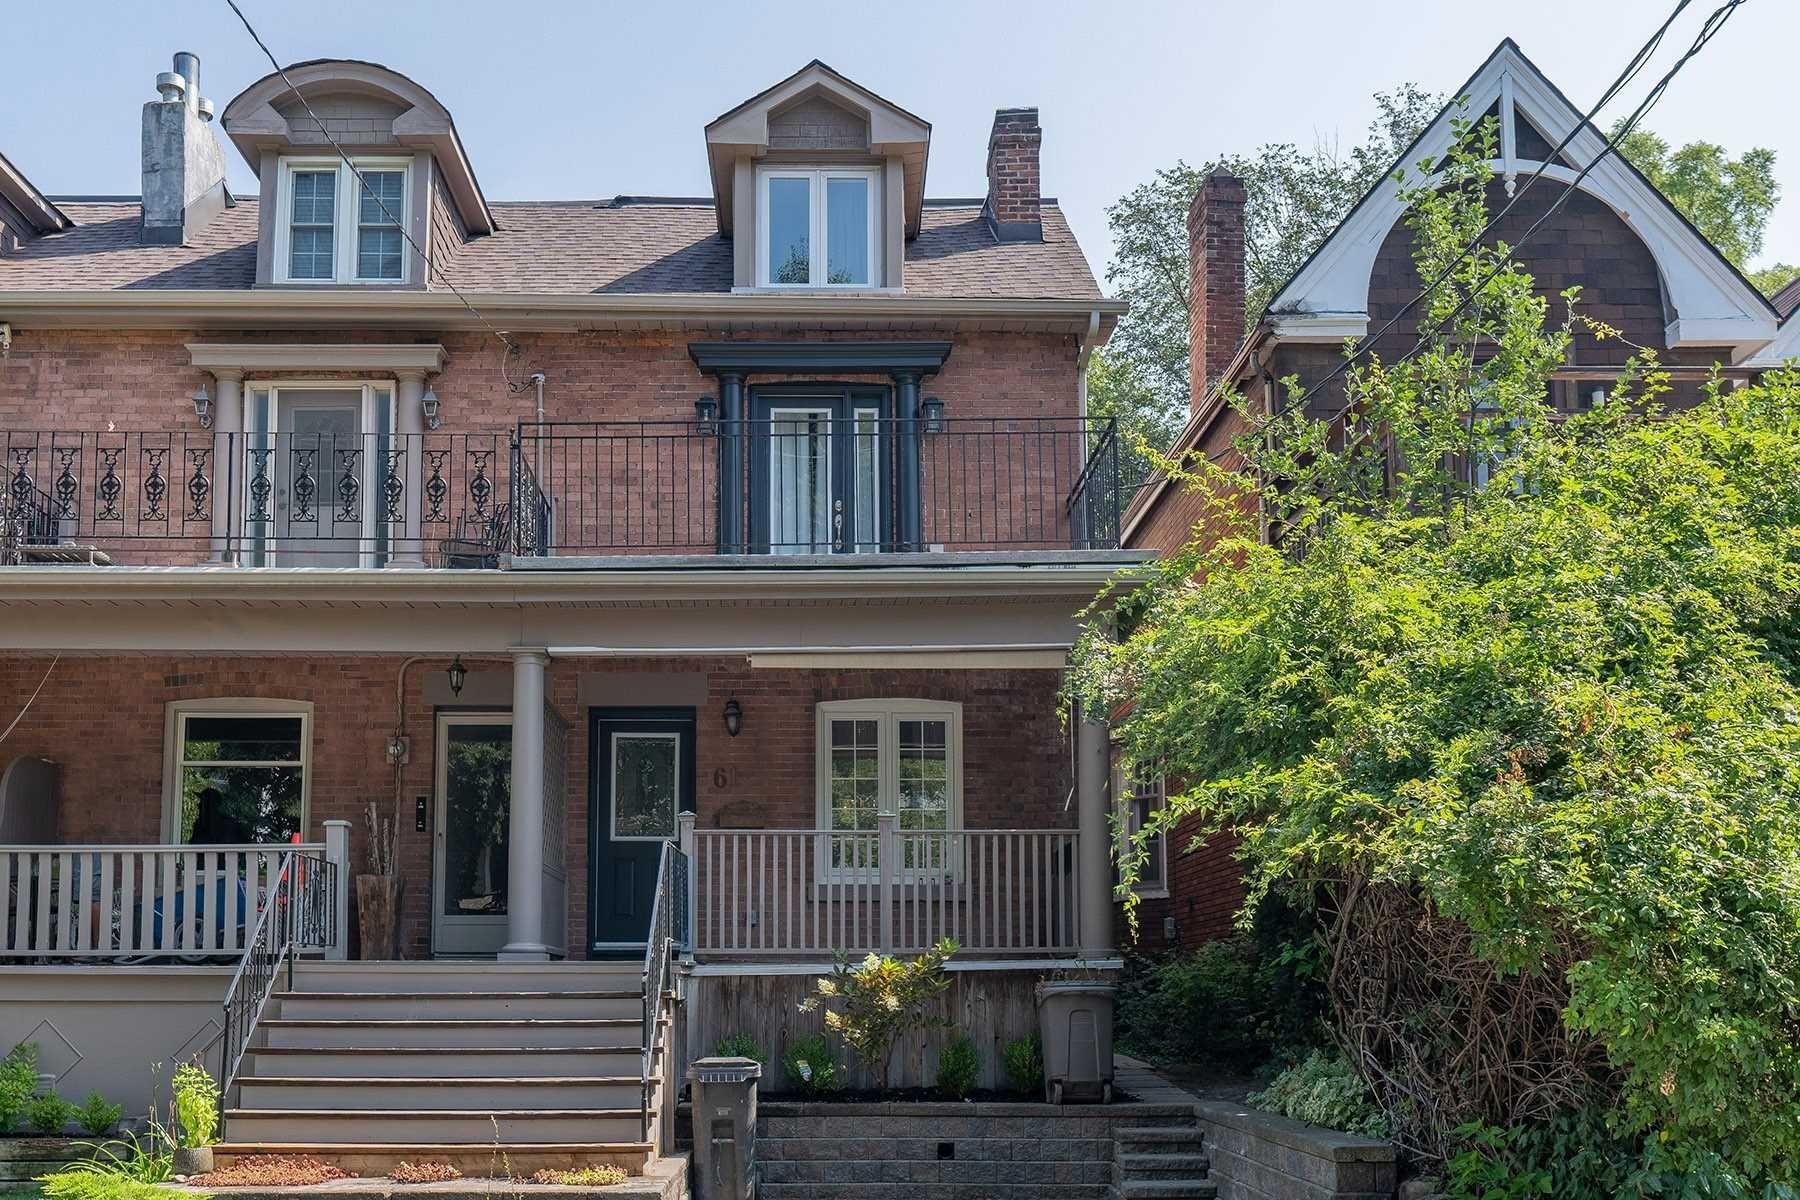 Main Photo: 61 Leuty Avenue in Toronto: The Beaches House (3-Storey) for lease (Toronto E02)  : MLS®# E5379543